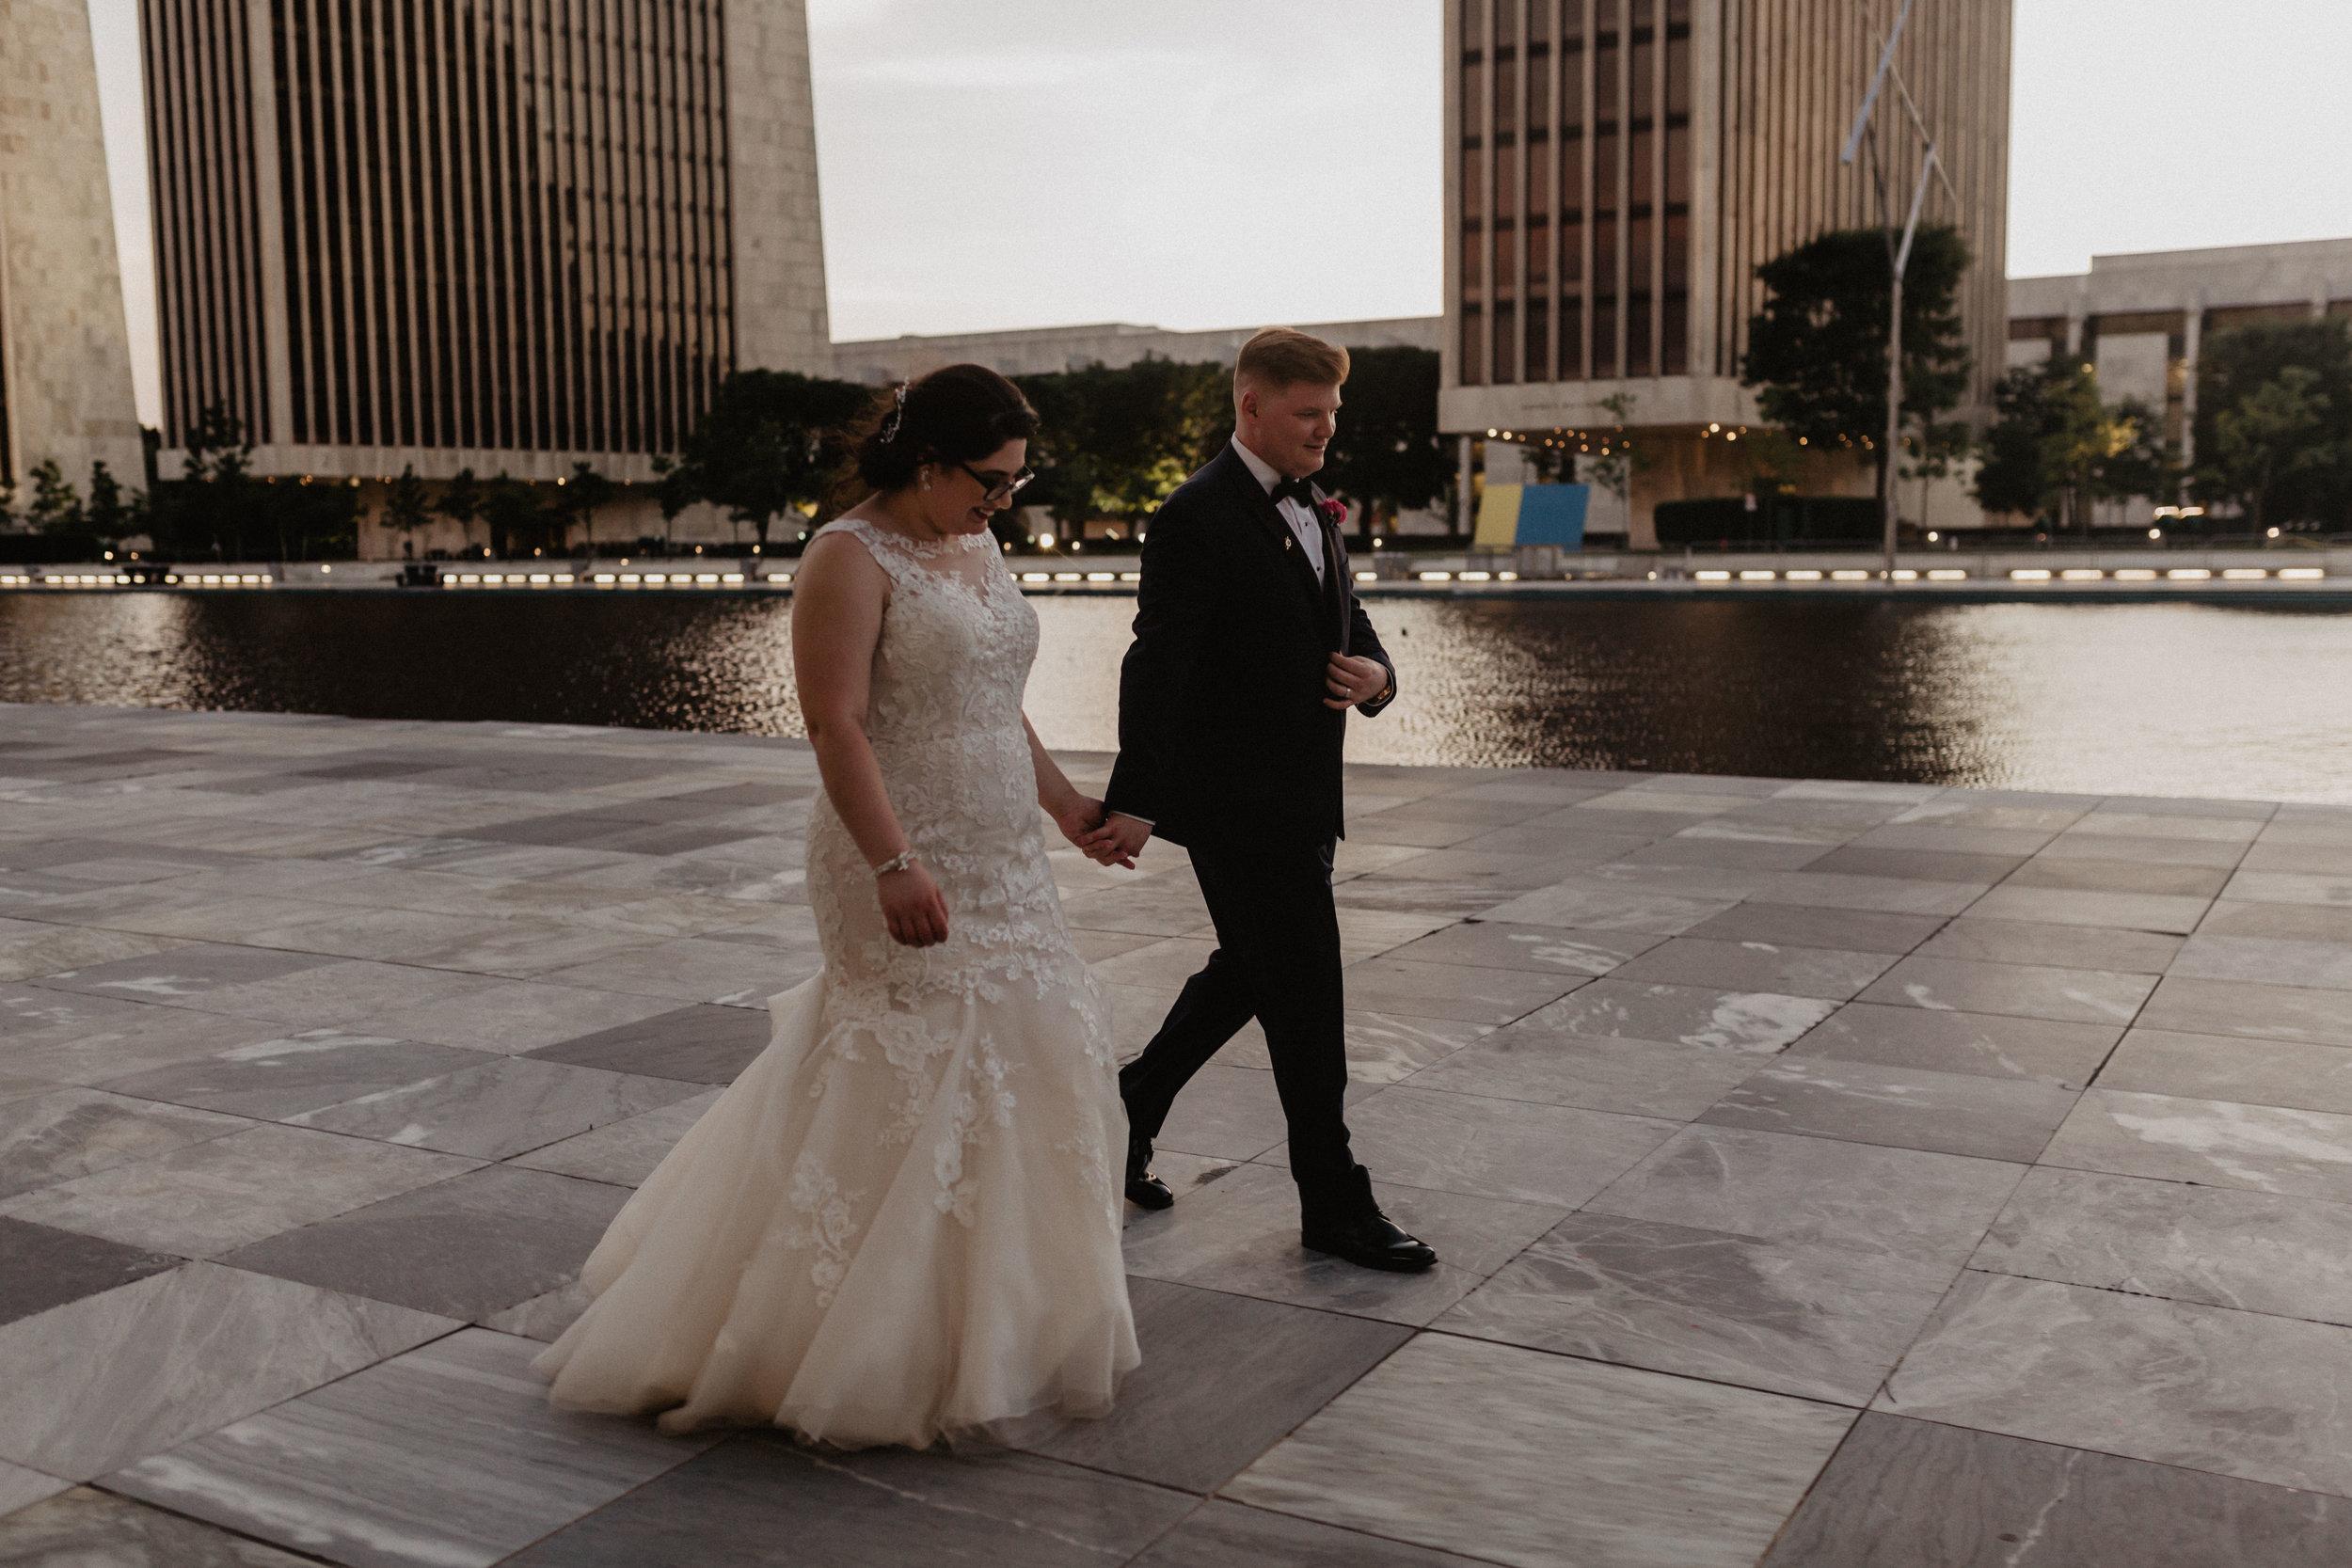 albany-new-york-wedding-77.jpg